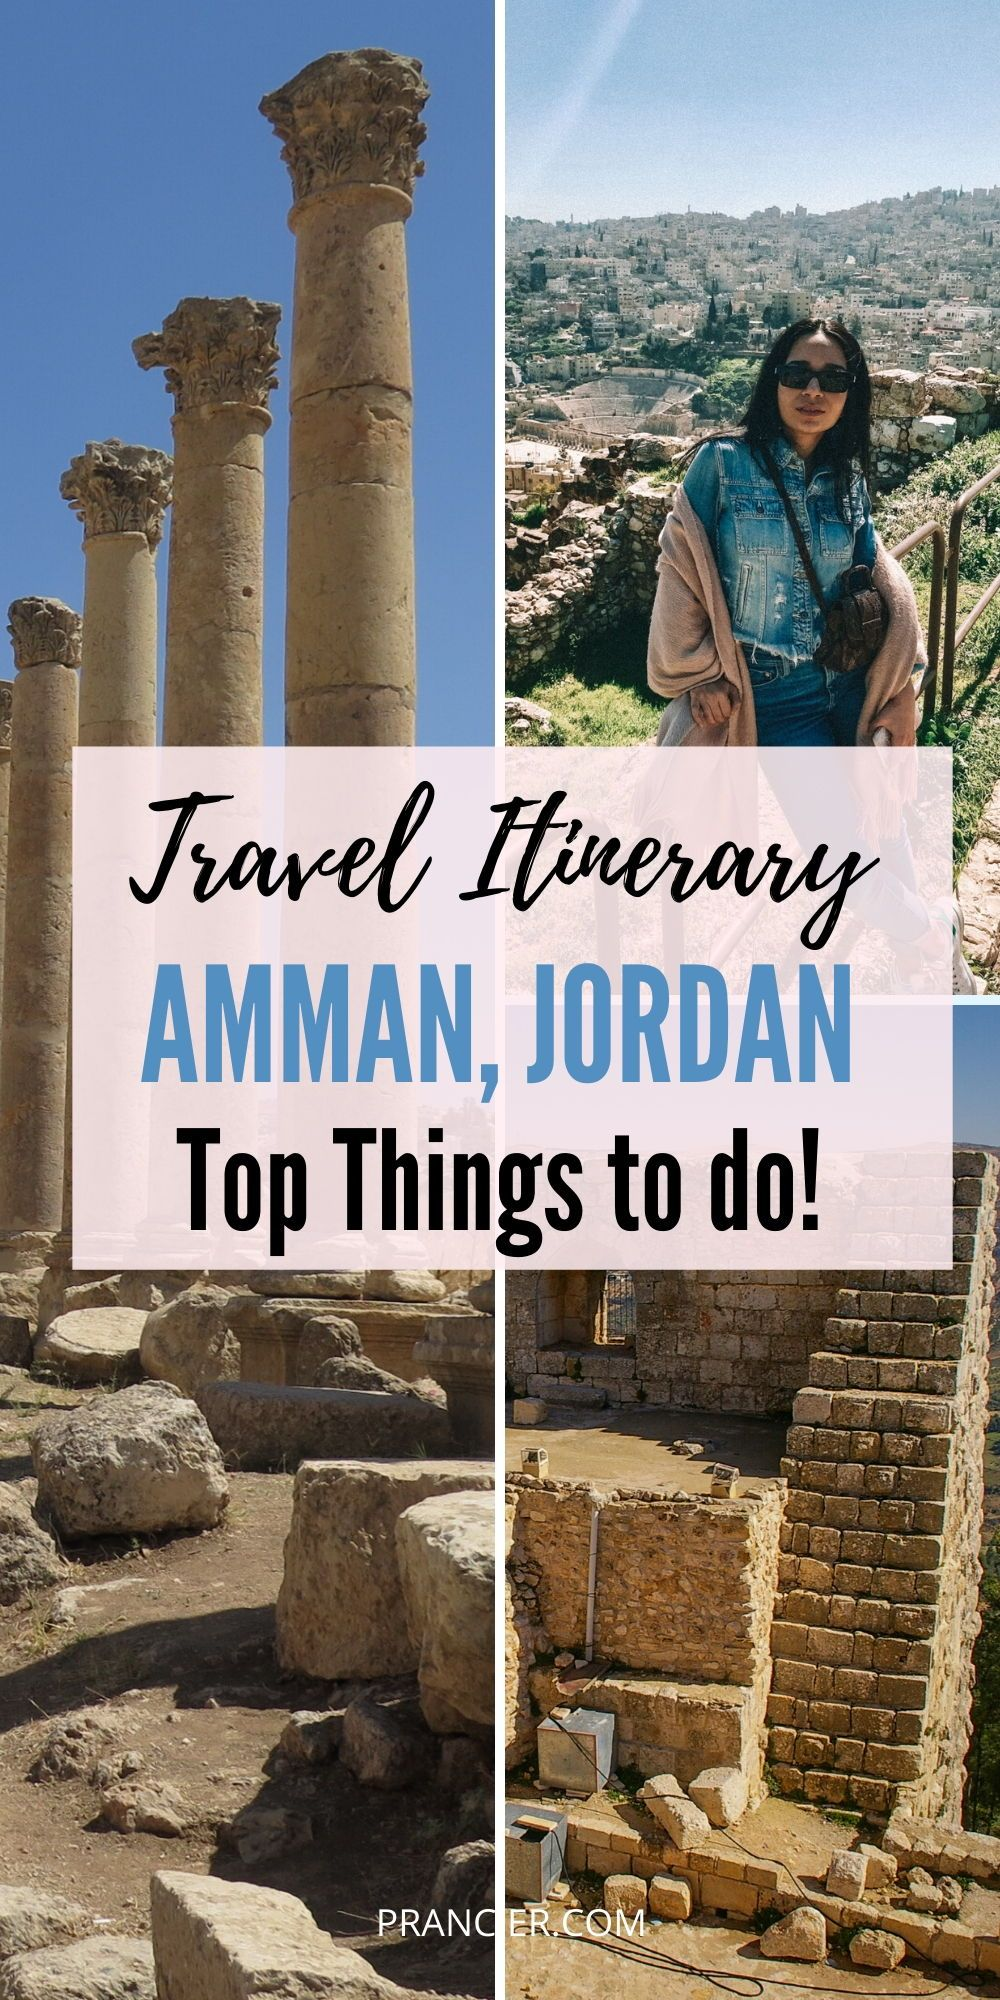 Top Things To Do In Amman, Jordan